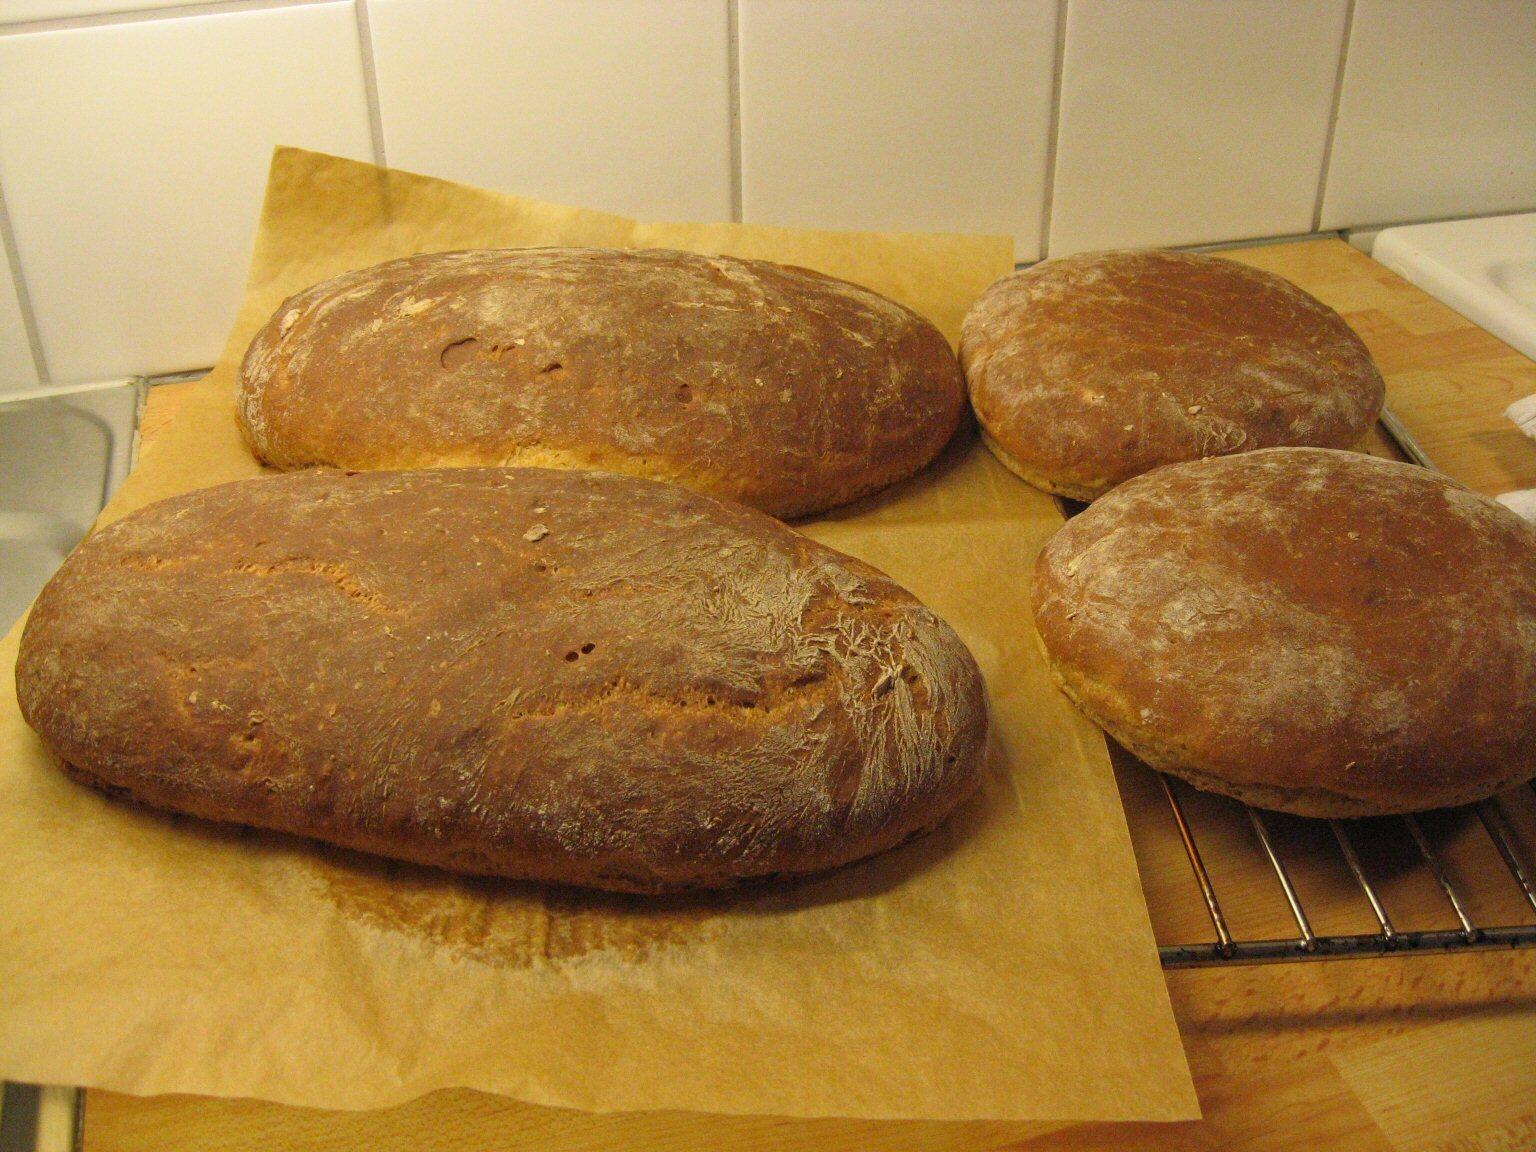 Mormors bröd